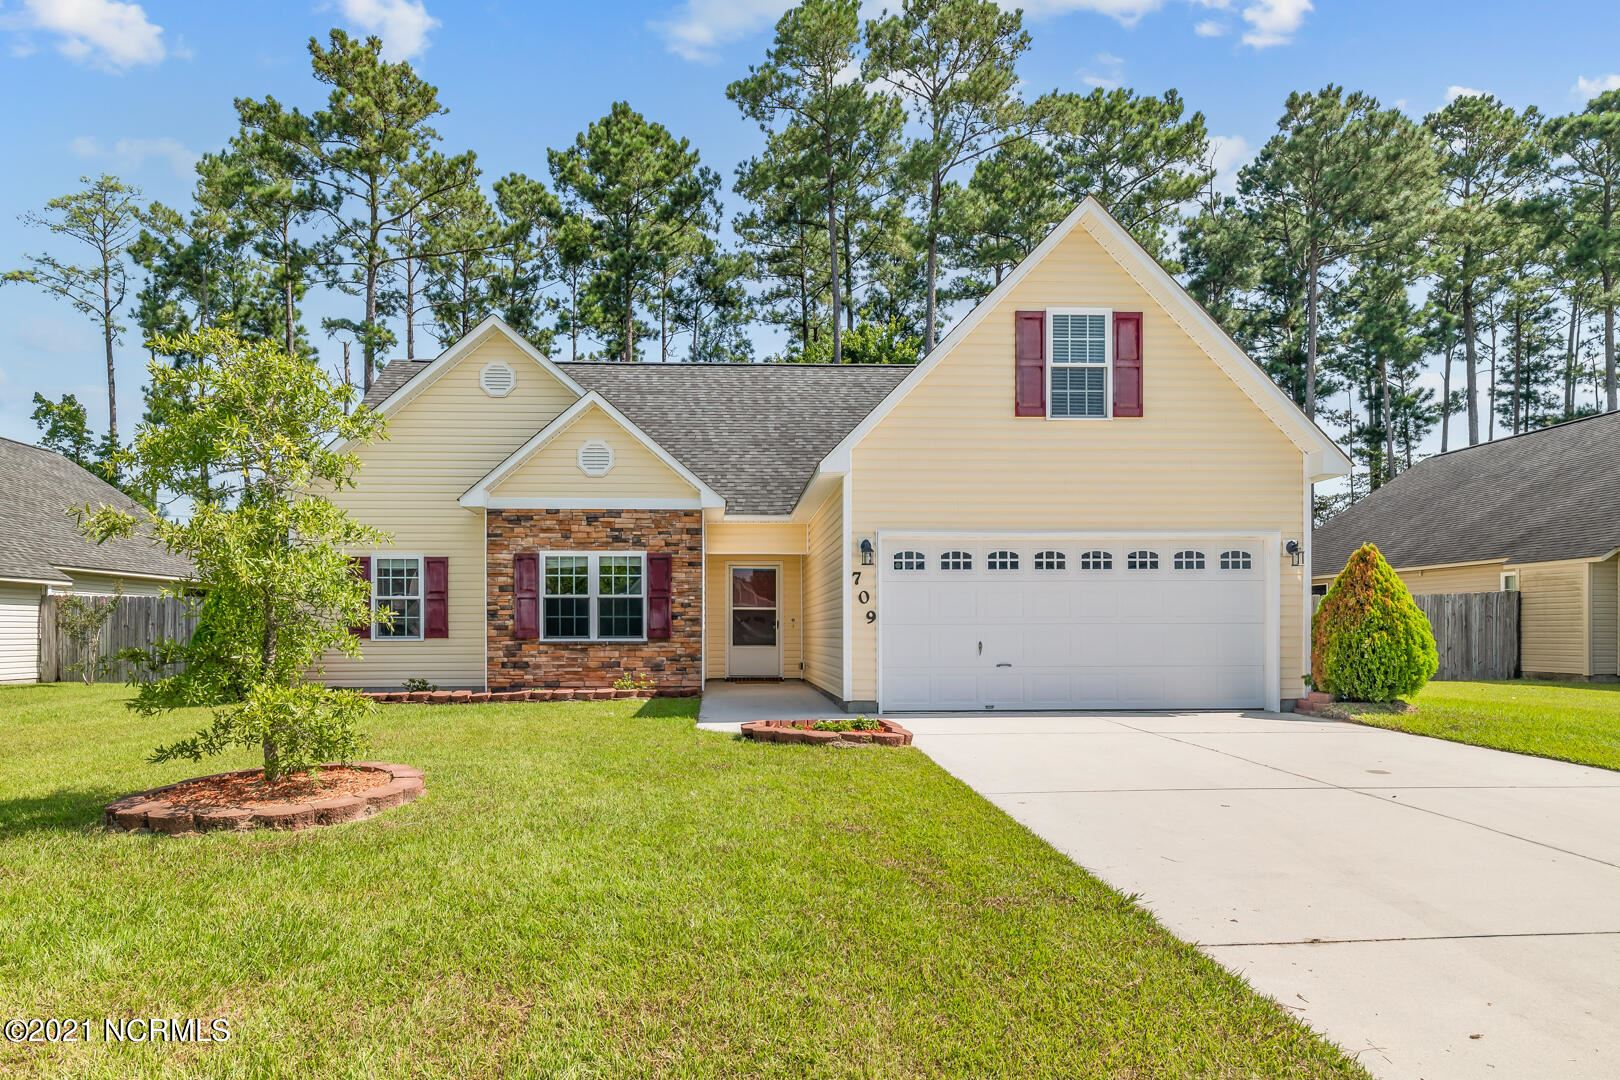 Photo of 709 Savannah Drive, Jacksonville, NC 28546 (MLS # 100289373)